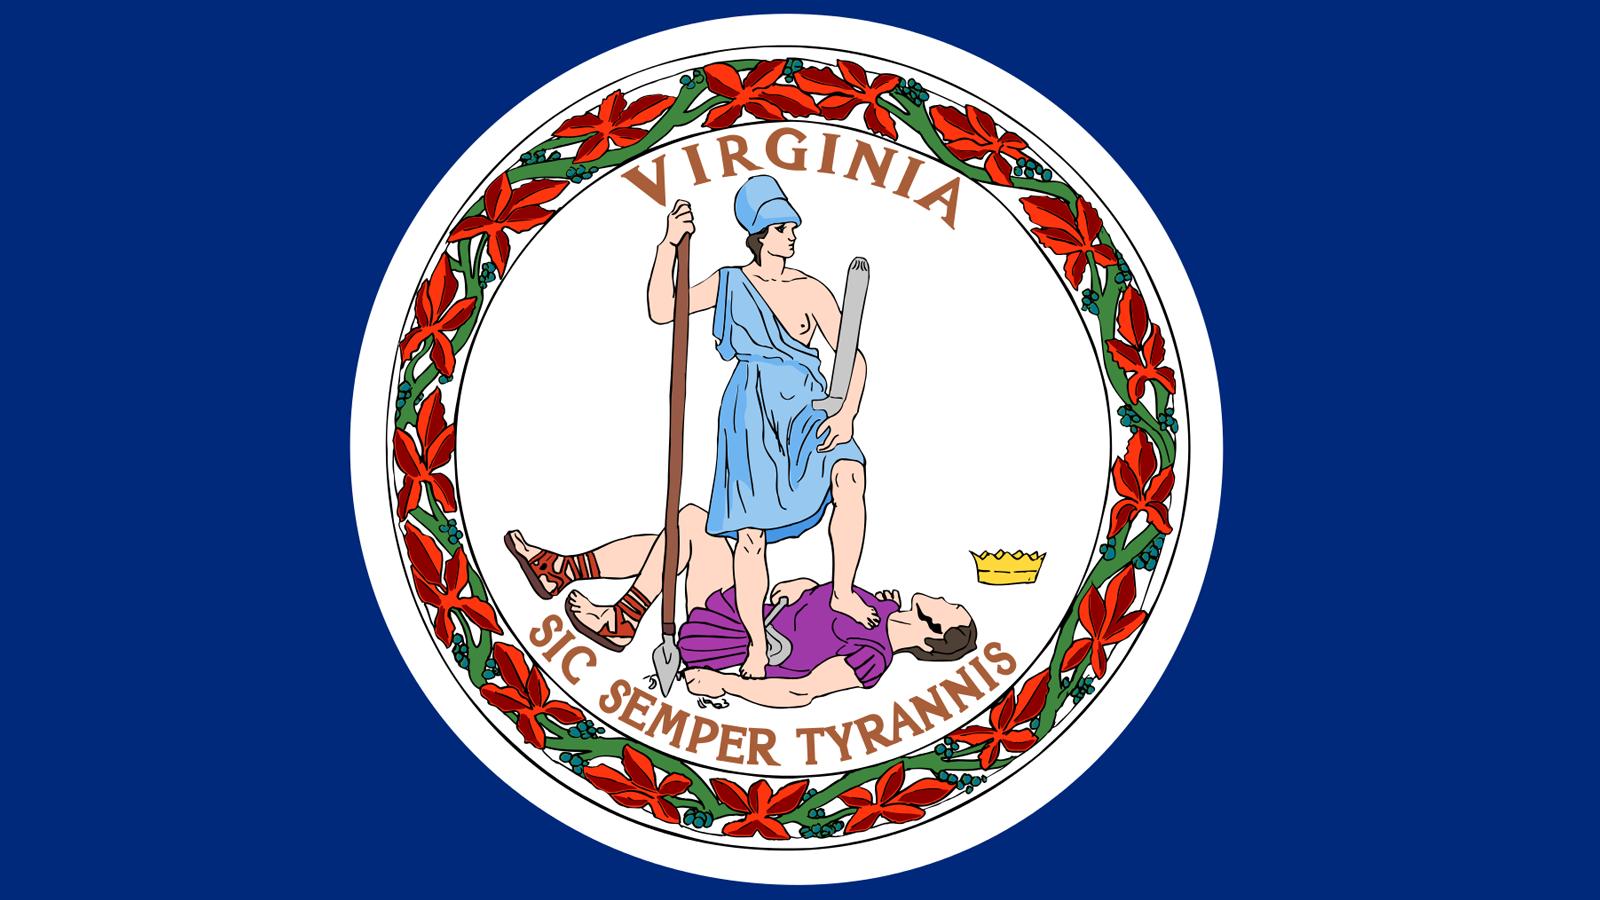 Virginia Values Coalition Announces Support for LGBTQ Non-Discrimination Protections